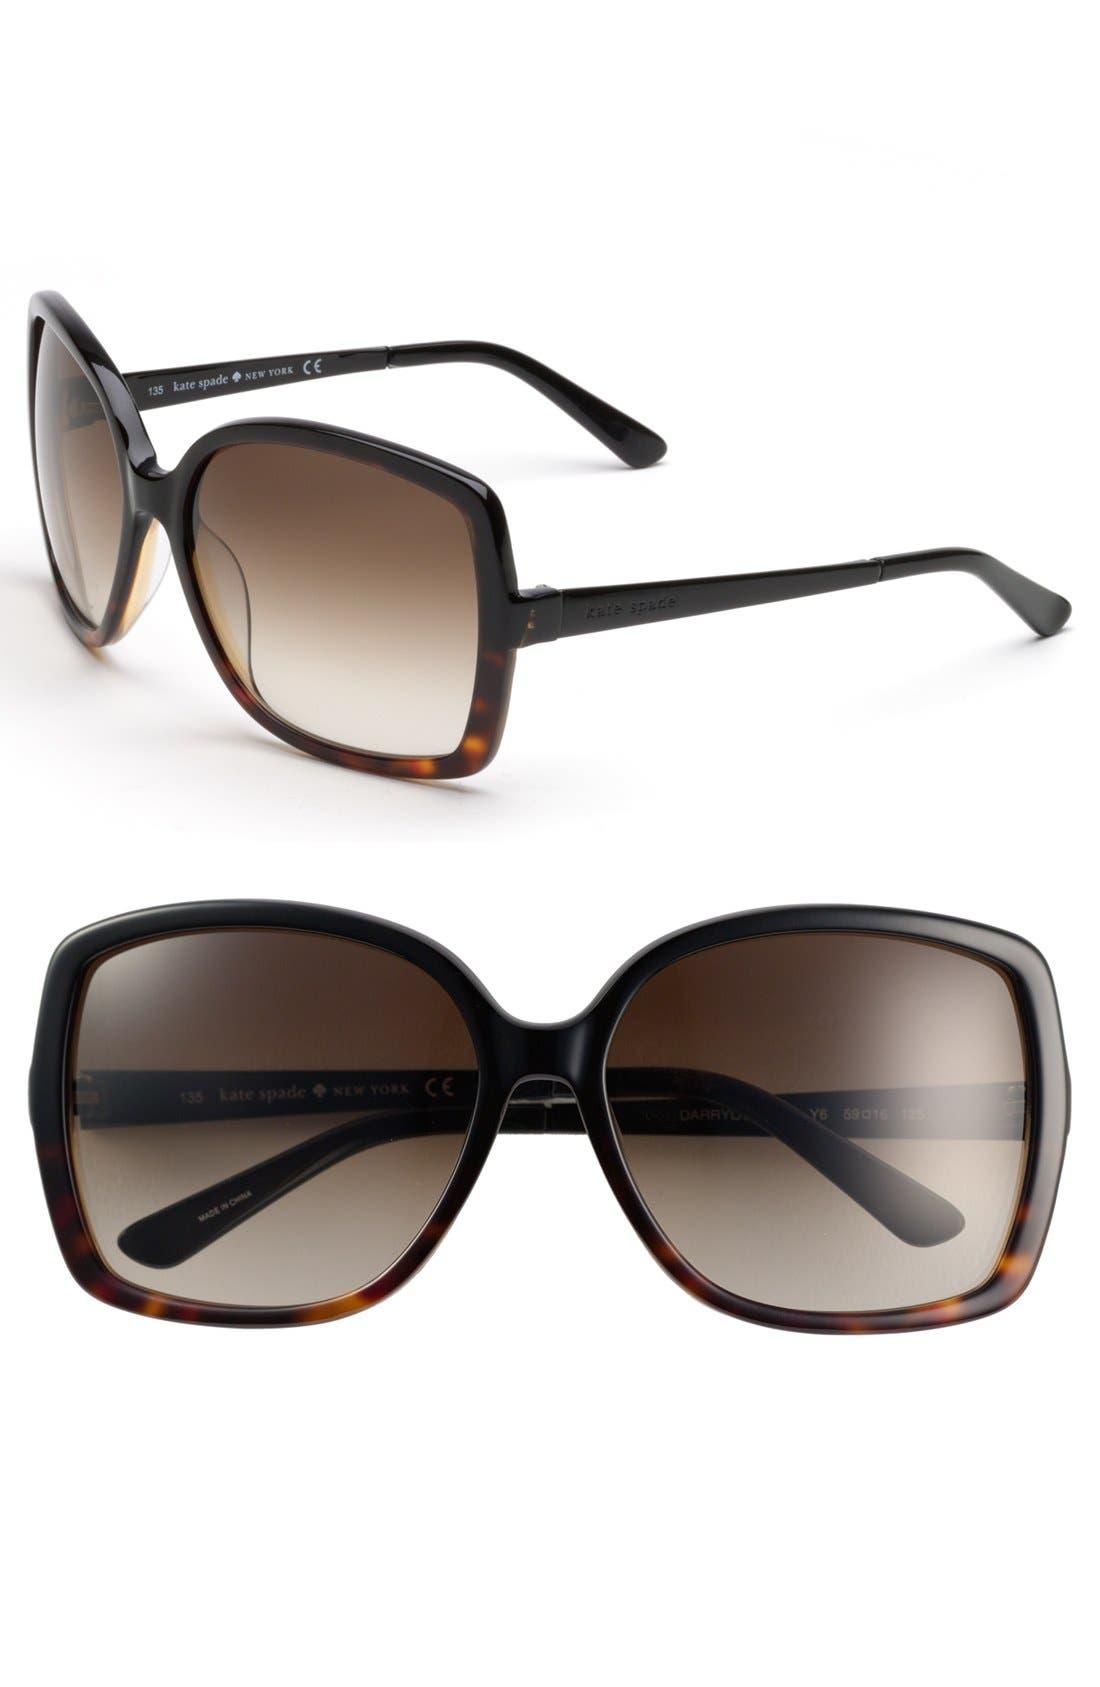 KATE SPADE NEW YORK, 'darryl' 59mm oversized sunglasses, Main thumbnail 1, color, 001